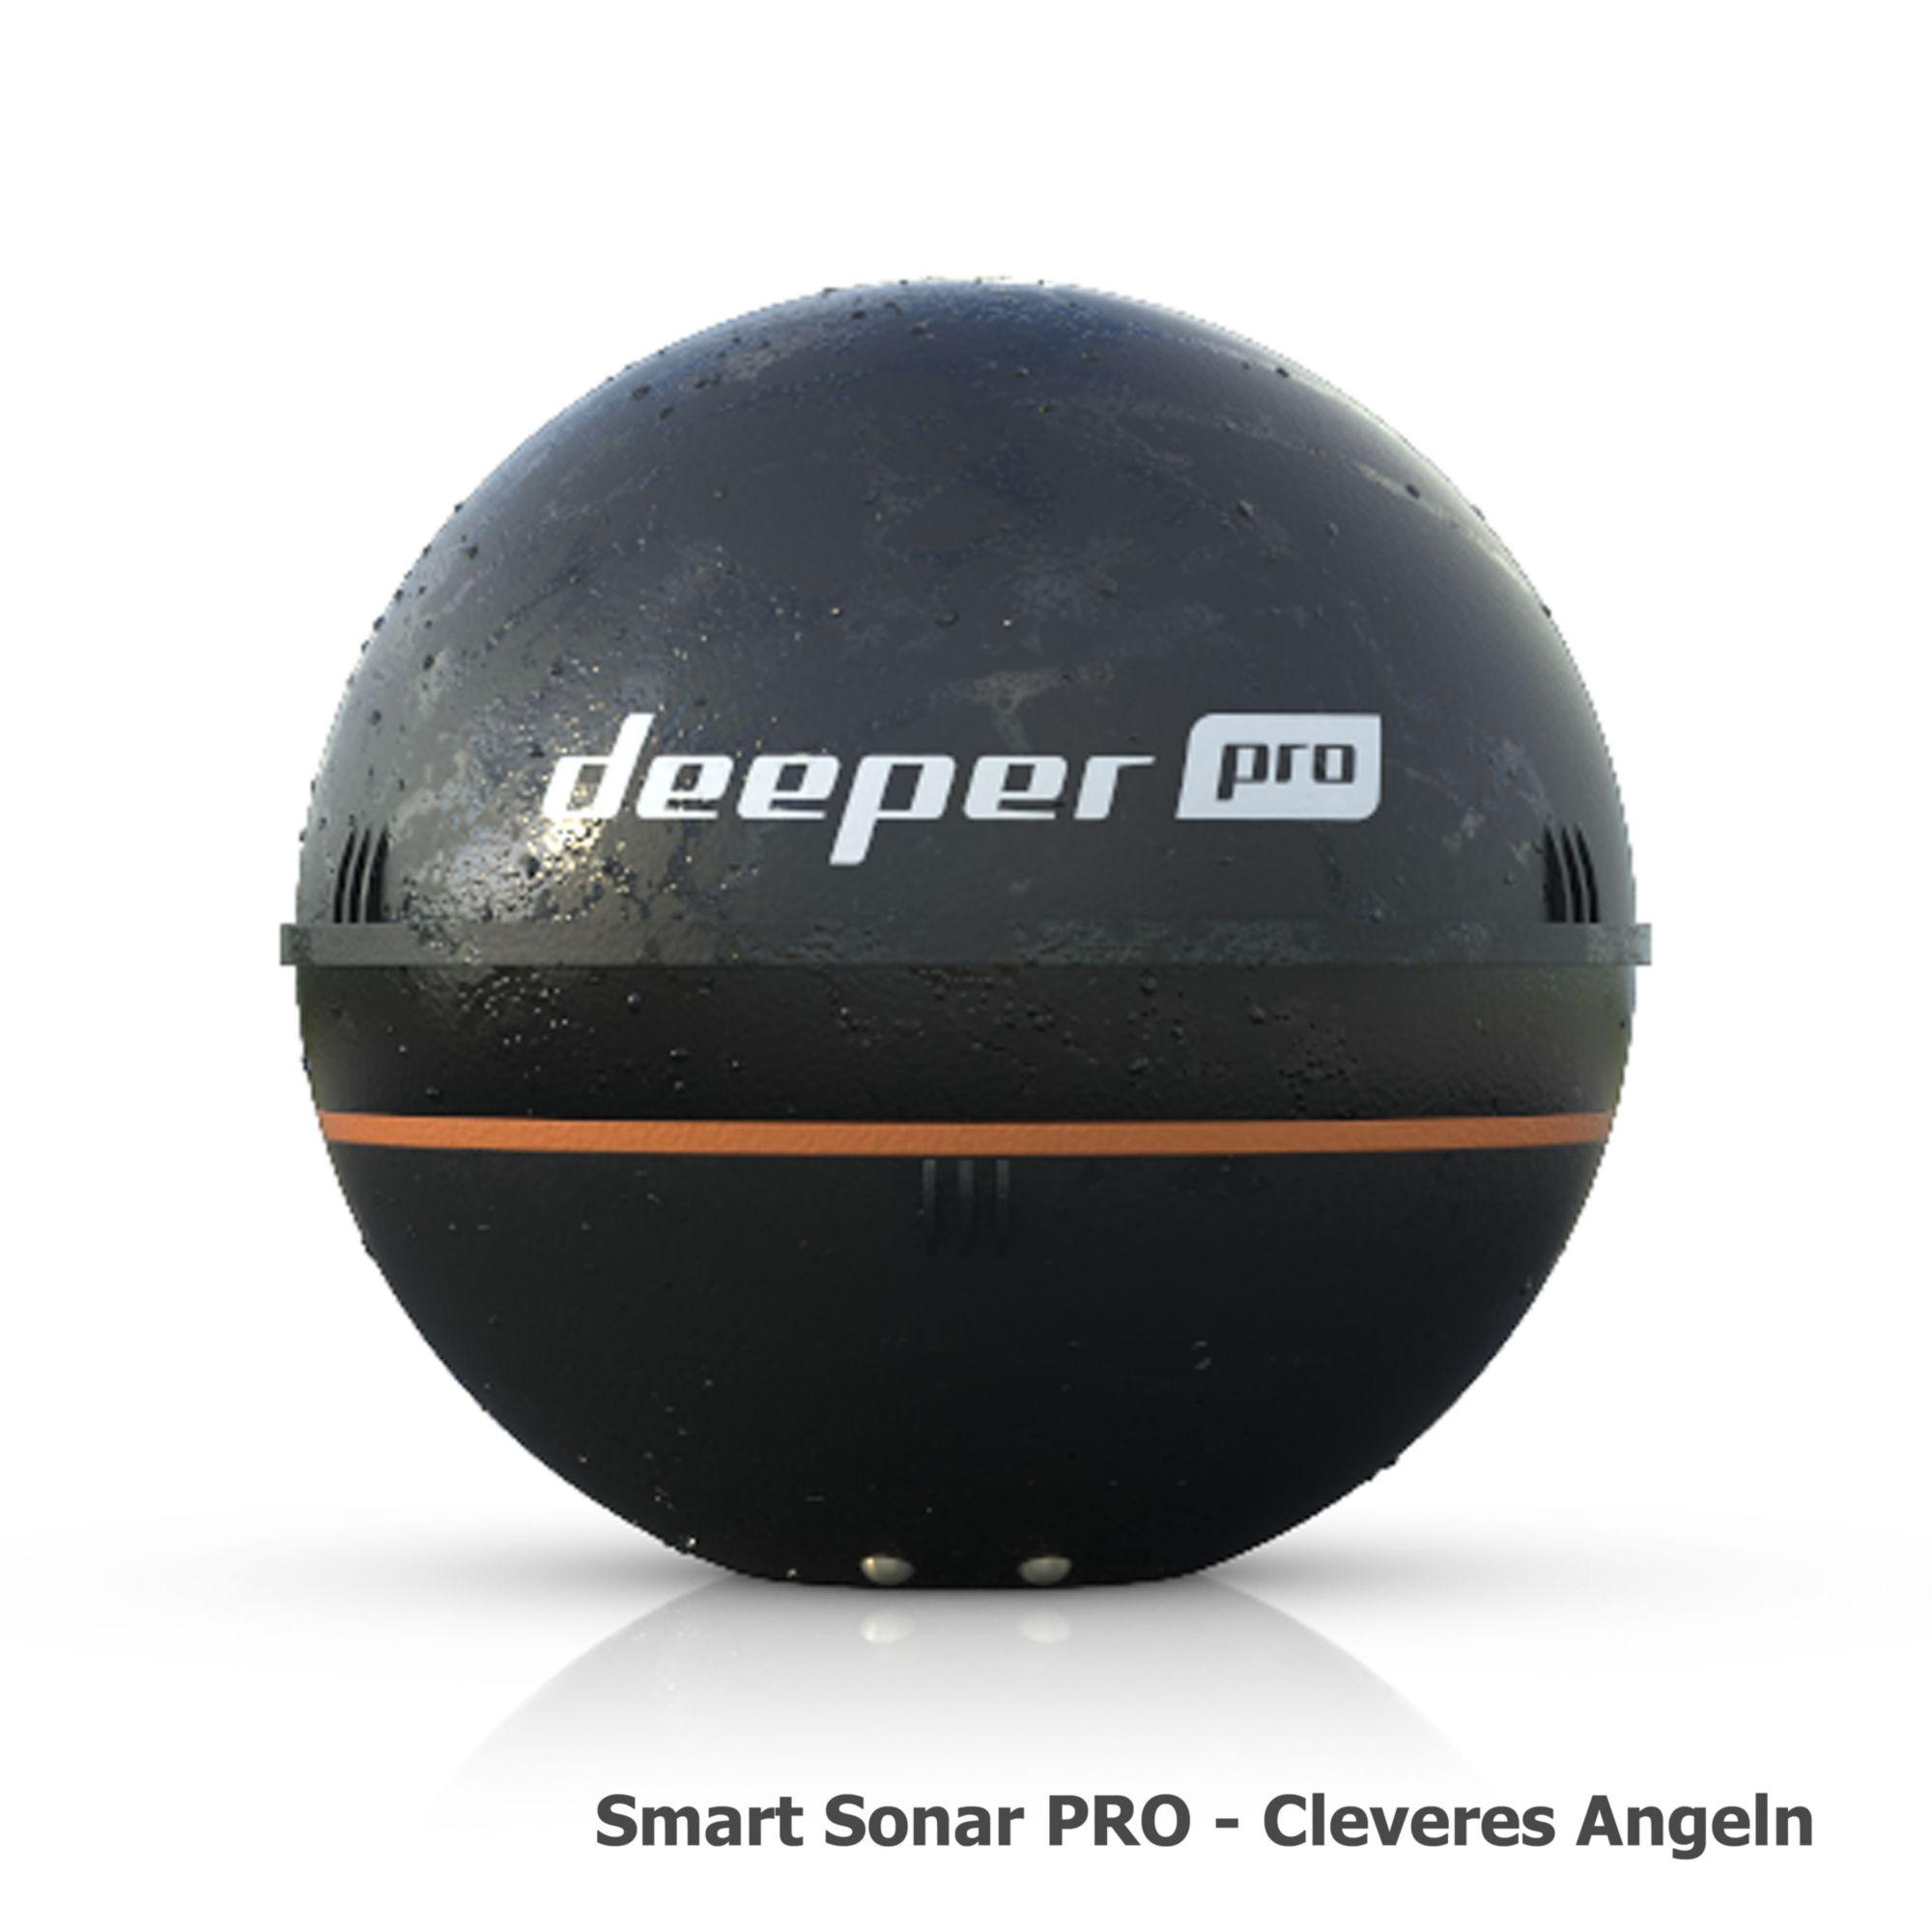 DEEPER deeper Kabelloses, auswerfbares Sonar / Echolot / Fischfinder »Smart Sonar Pro DP1H20S10«